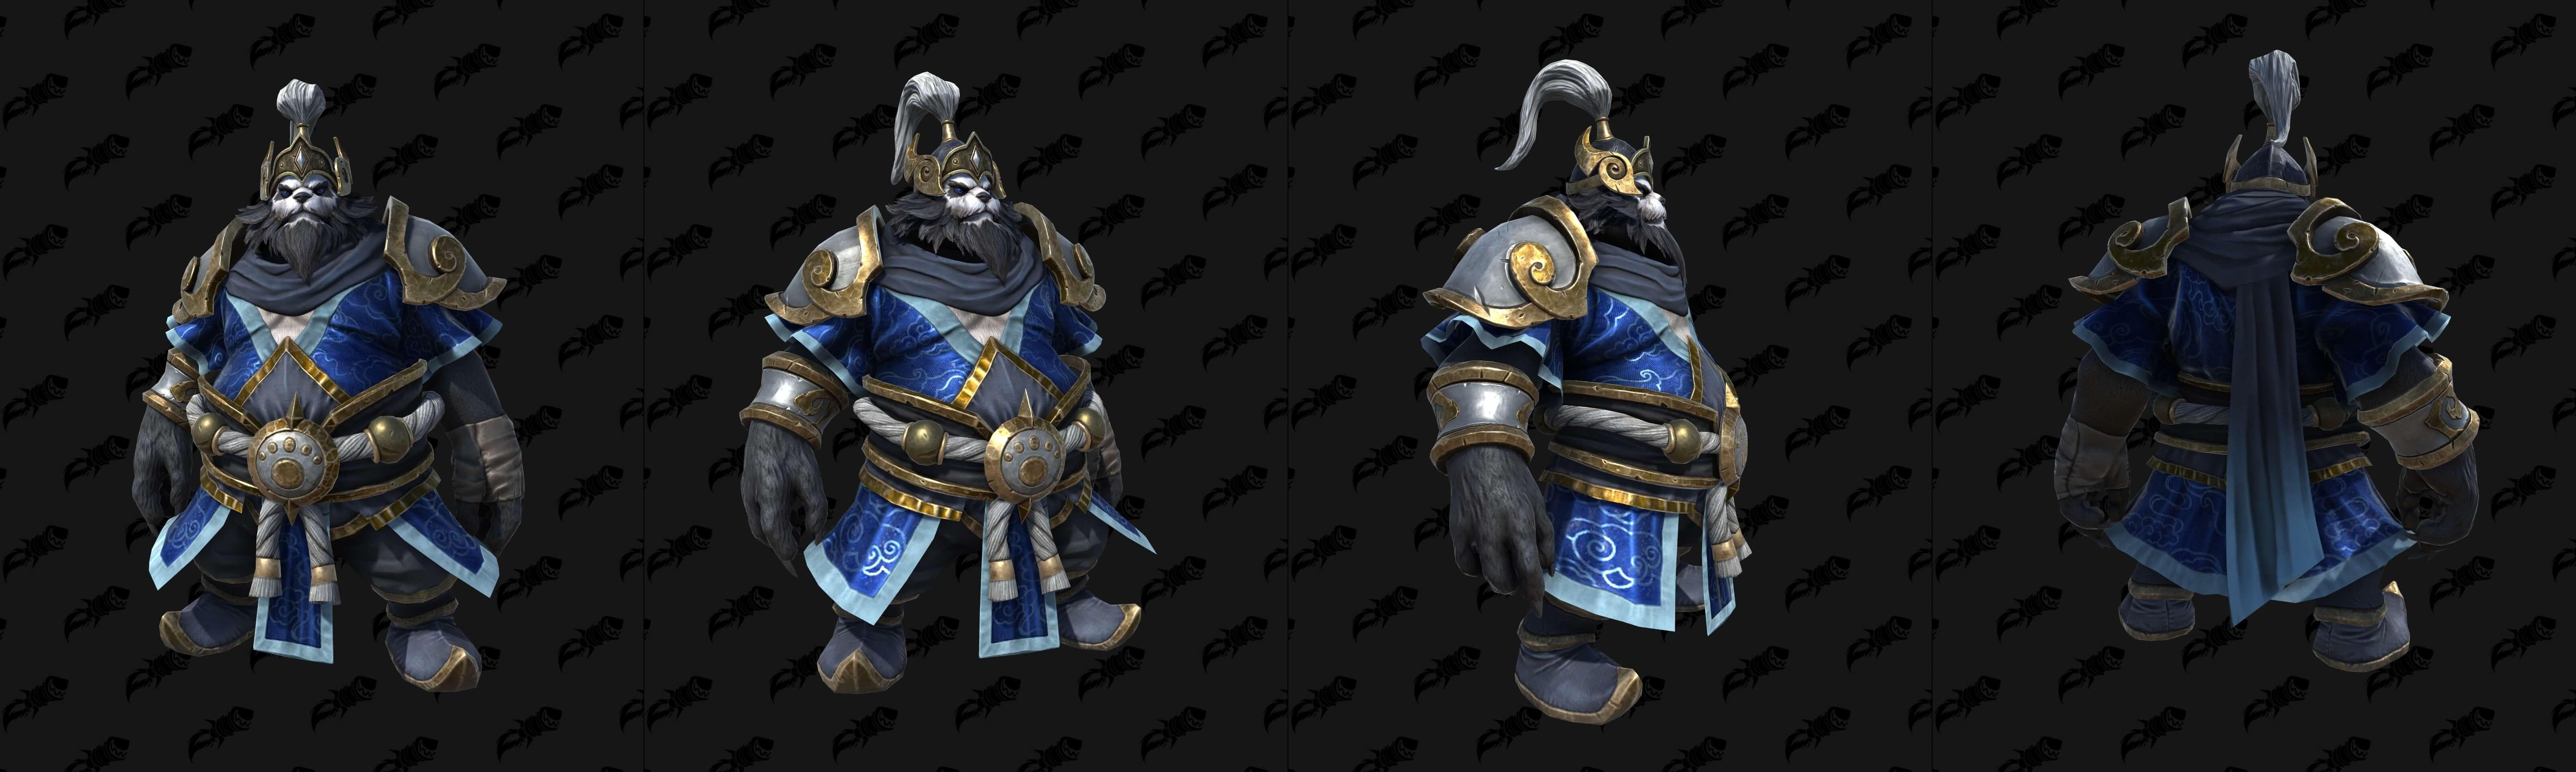 Чэнь Буйный Портер (Буря) Warcraft lll: Reforged